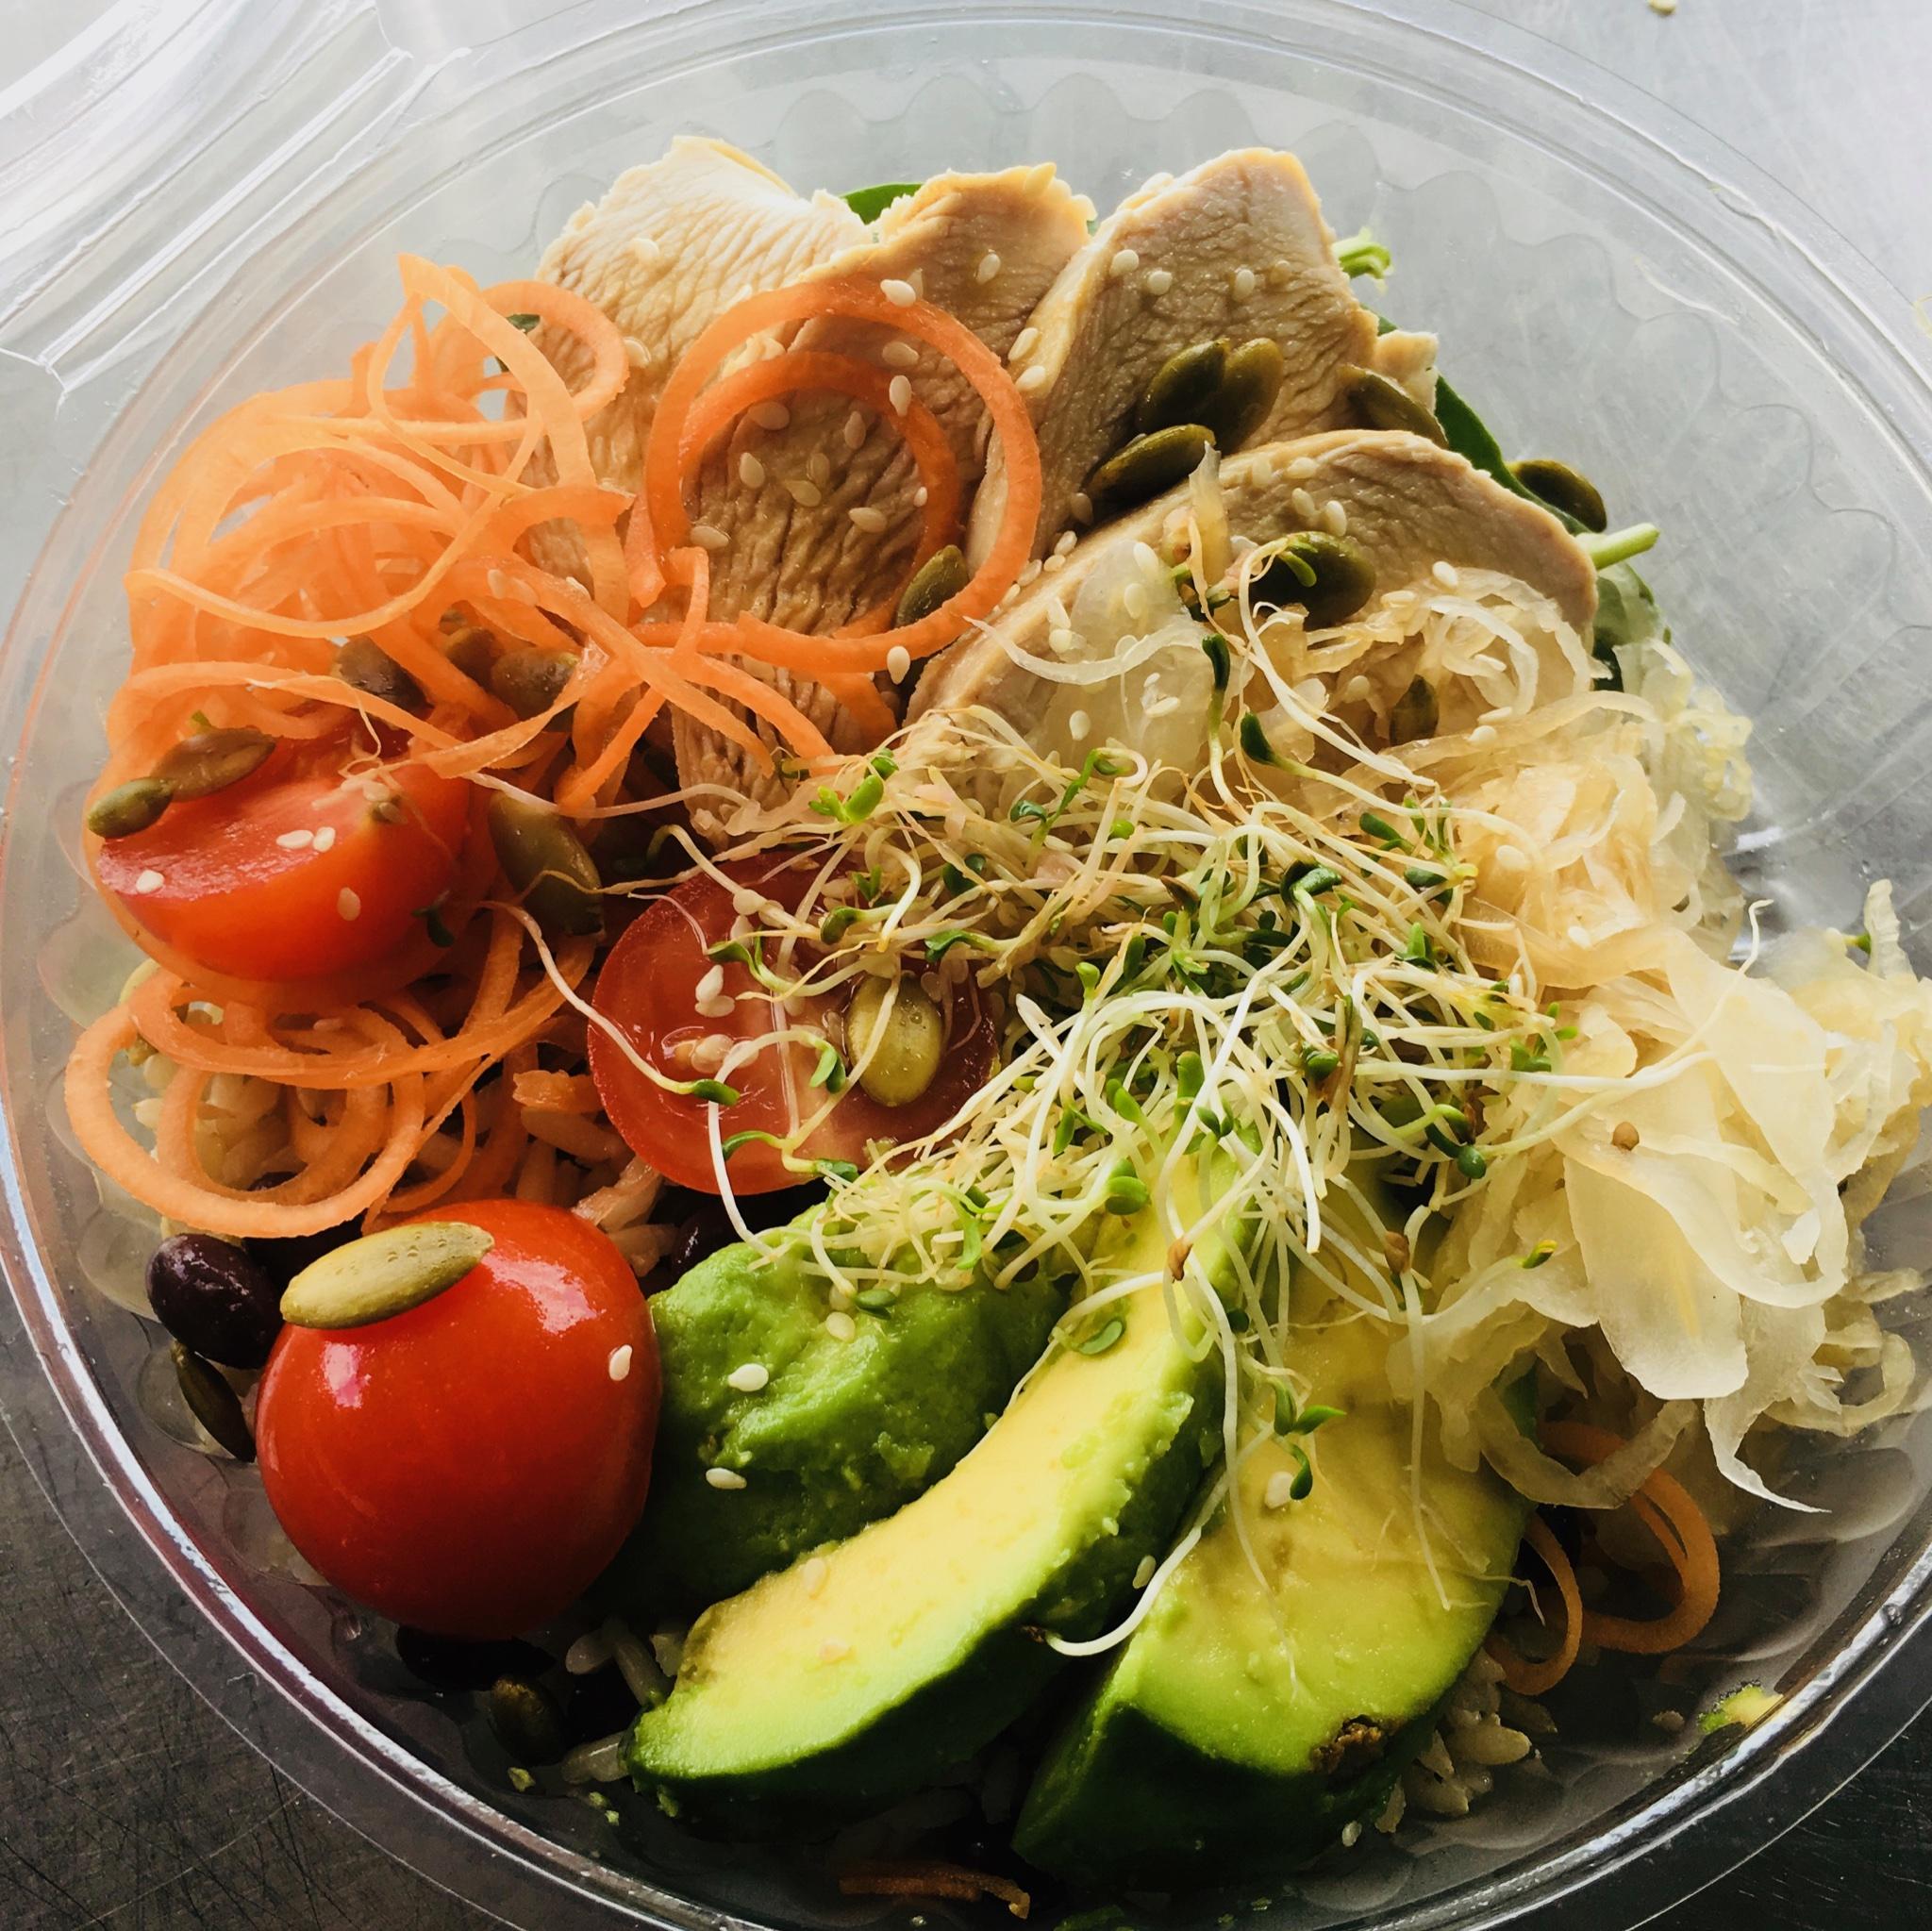 Chicken & salad bowl